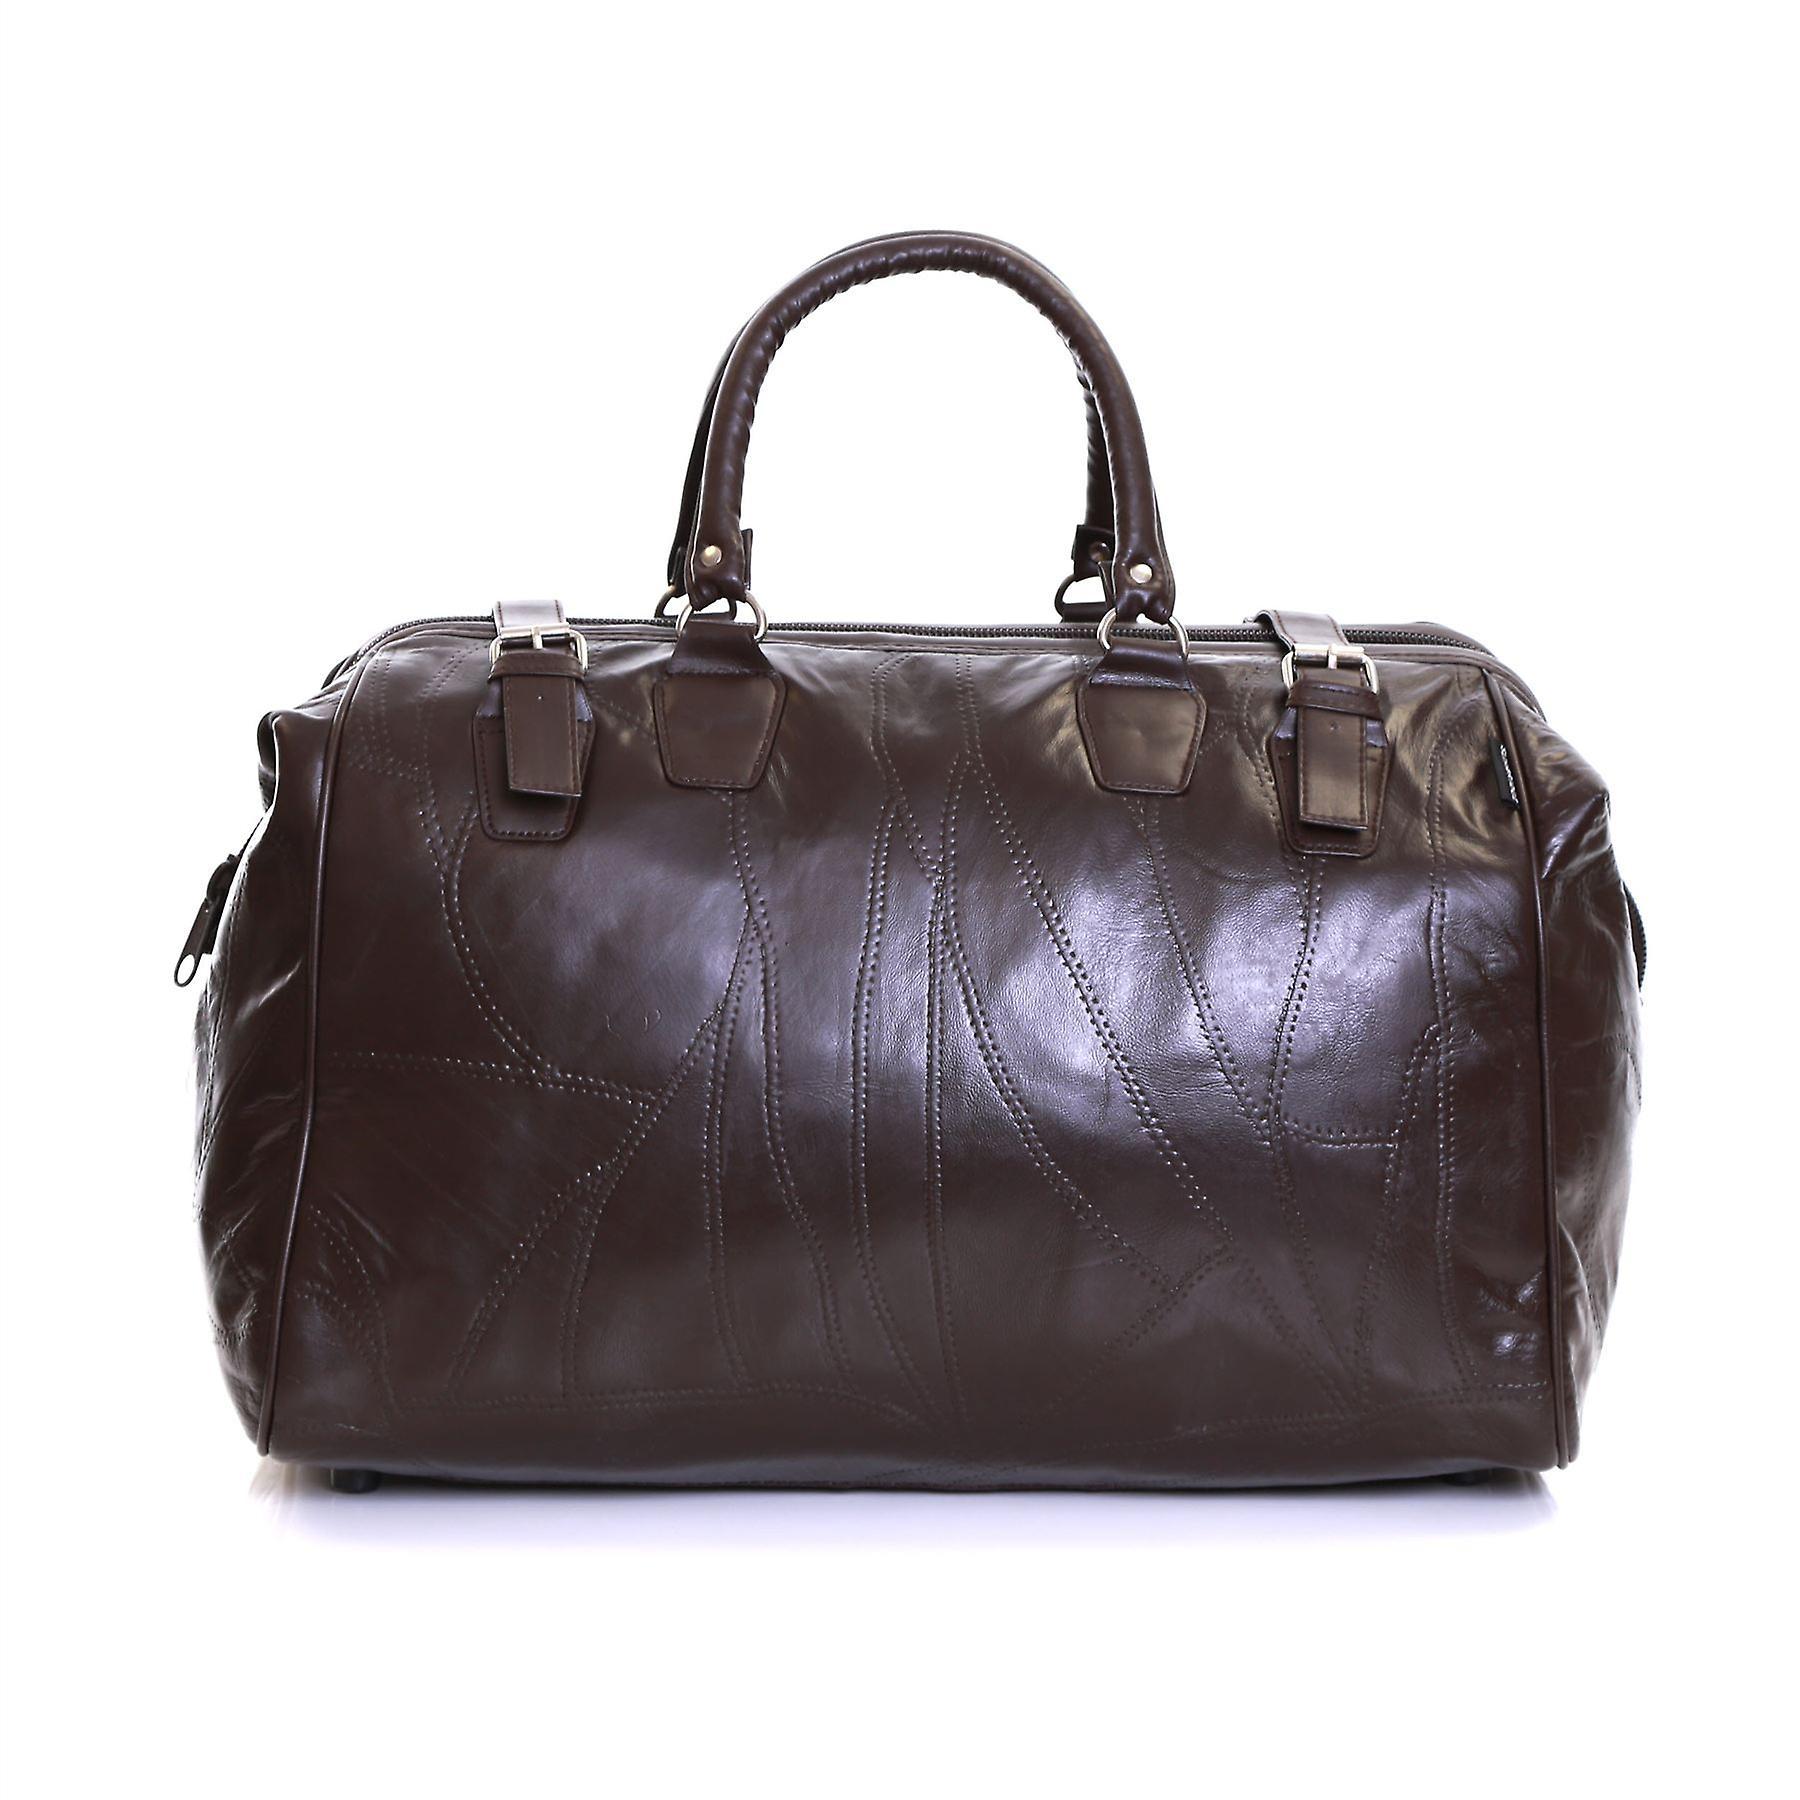 Slimbridge Malaga Leather Travel Bag, Brown